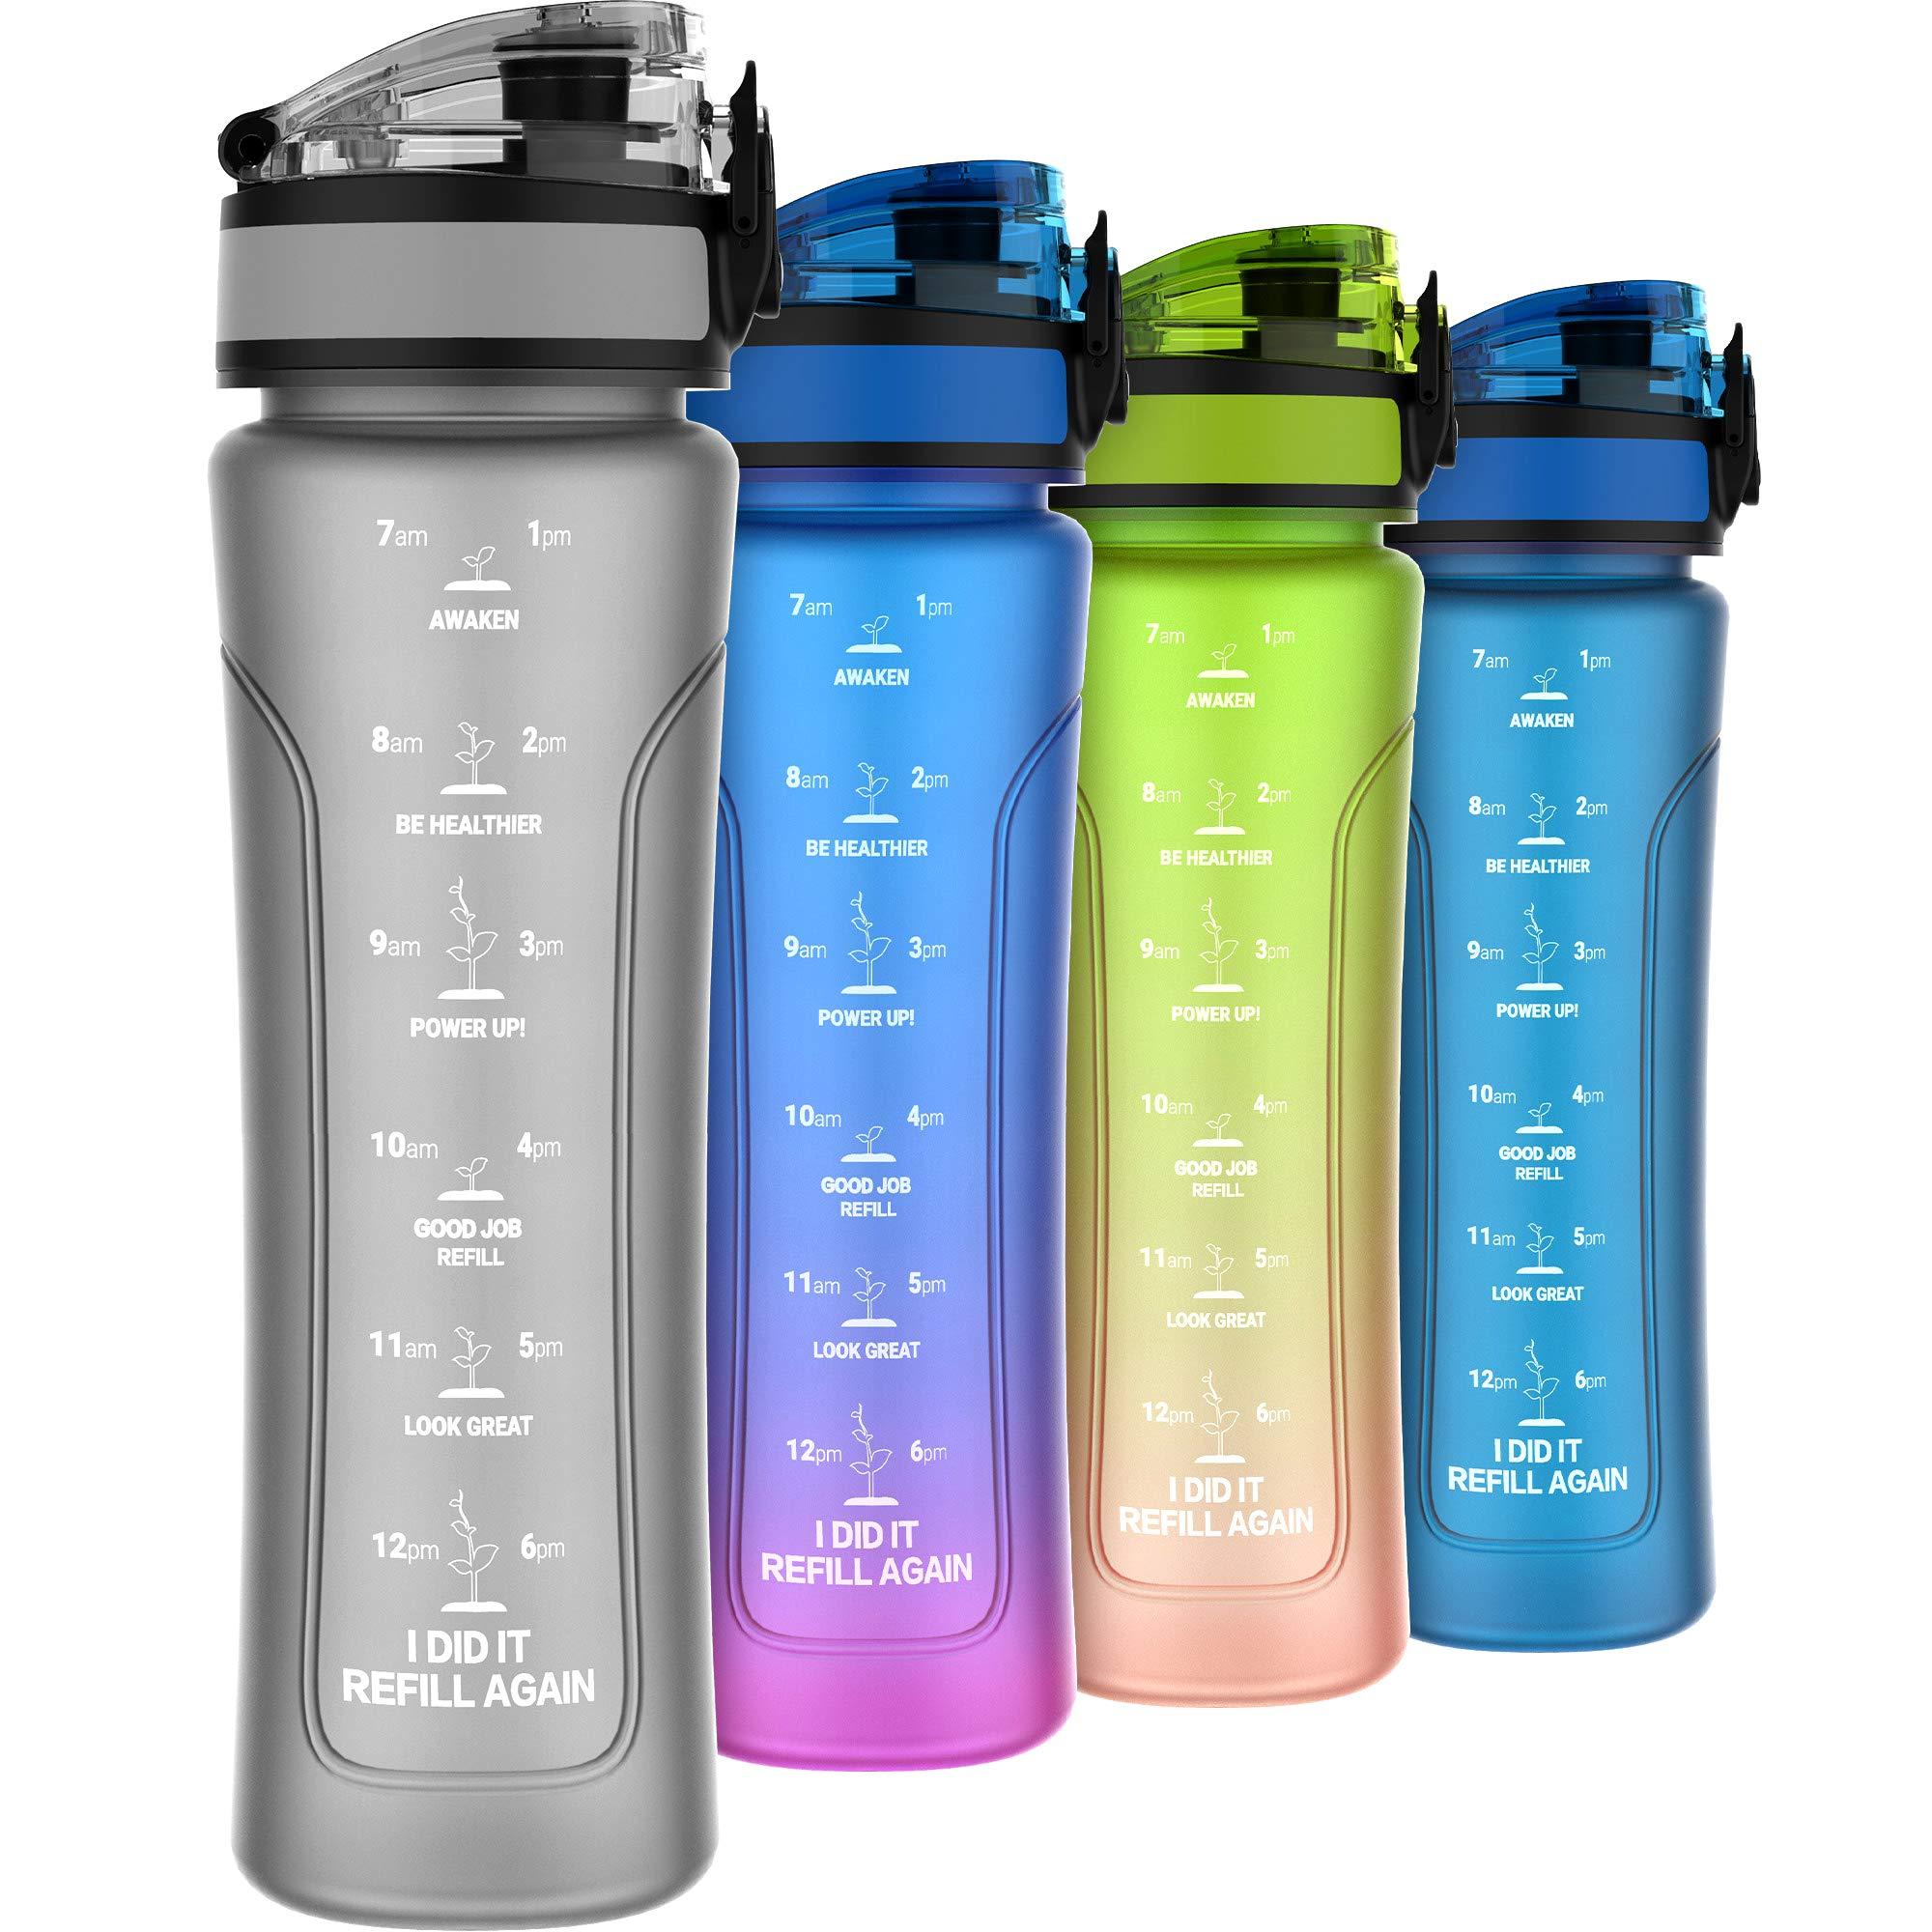 Kids Water Bottles with Times to Drink, 15oz Leak-proof Water Bottle for Kids/Women, BPA Free Tritan Plastic, One-hand Opening Technology (Grey)